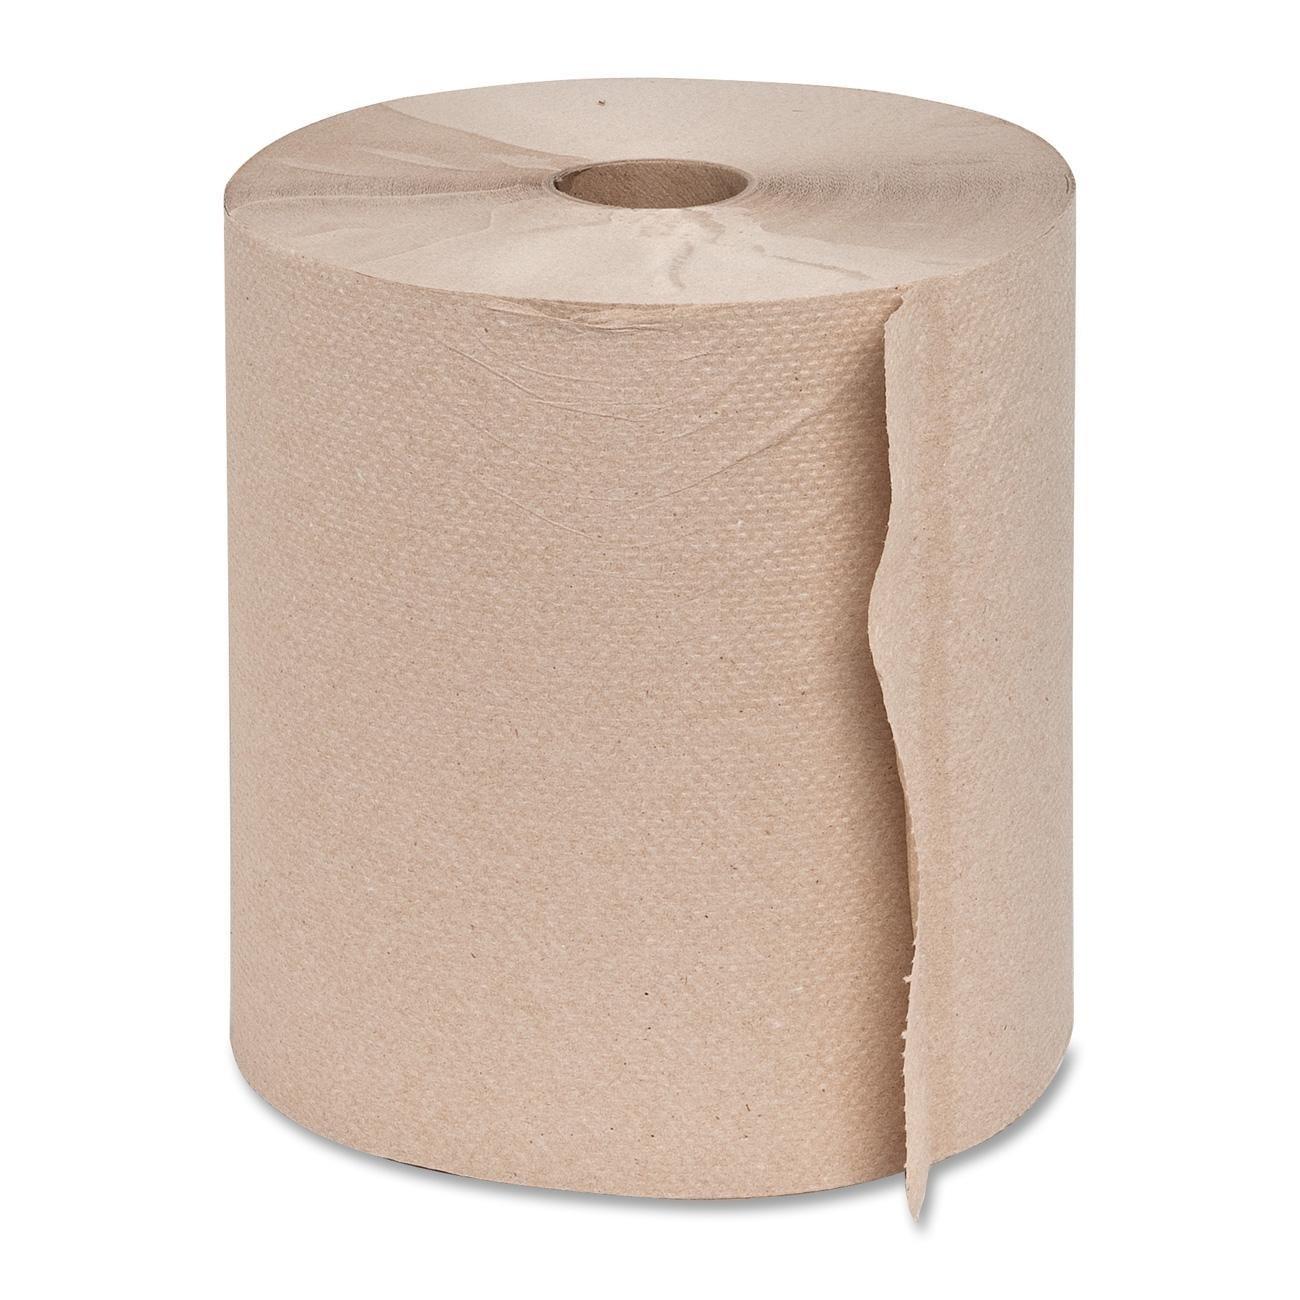 Genuine Joe GJO22600 Hard Wound Roll Towel, 800' Length x 7-8/9'' Width, Natural (Case of 6)